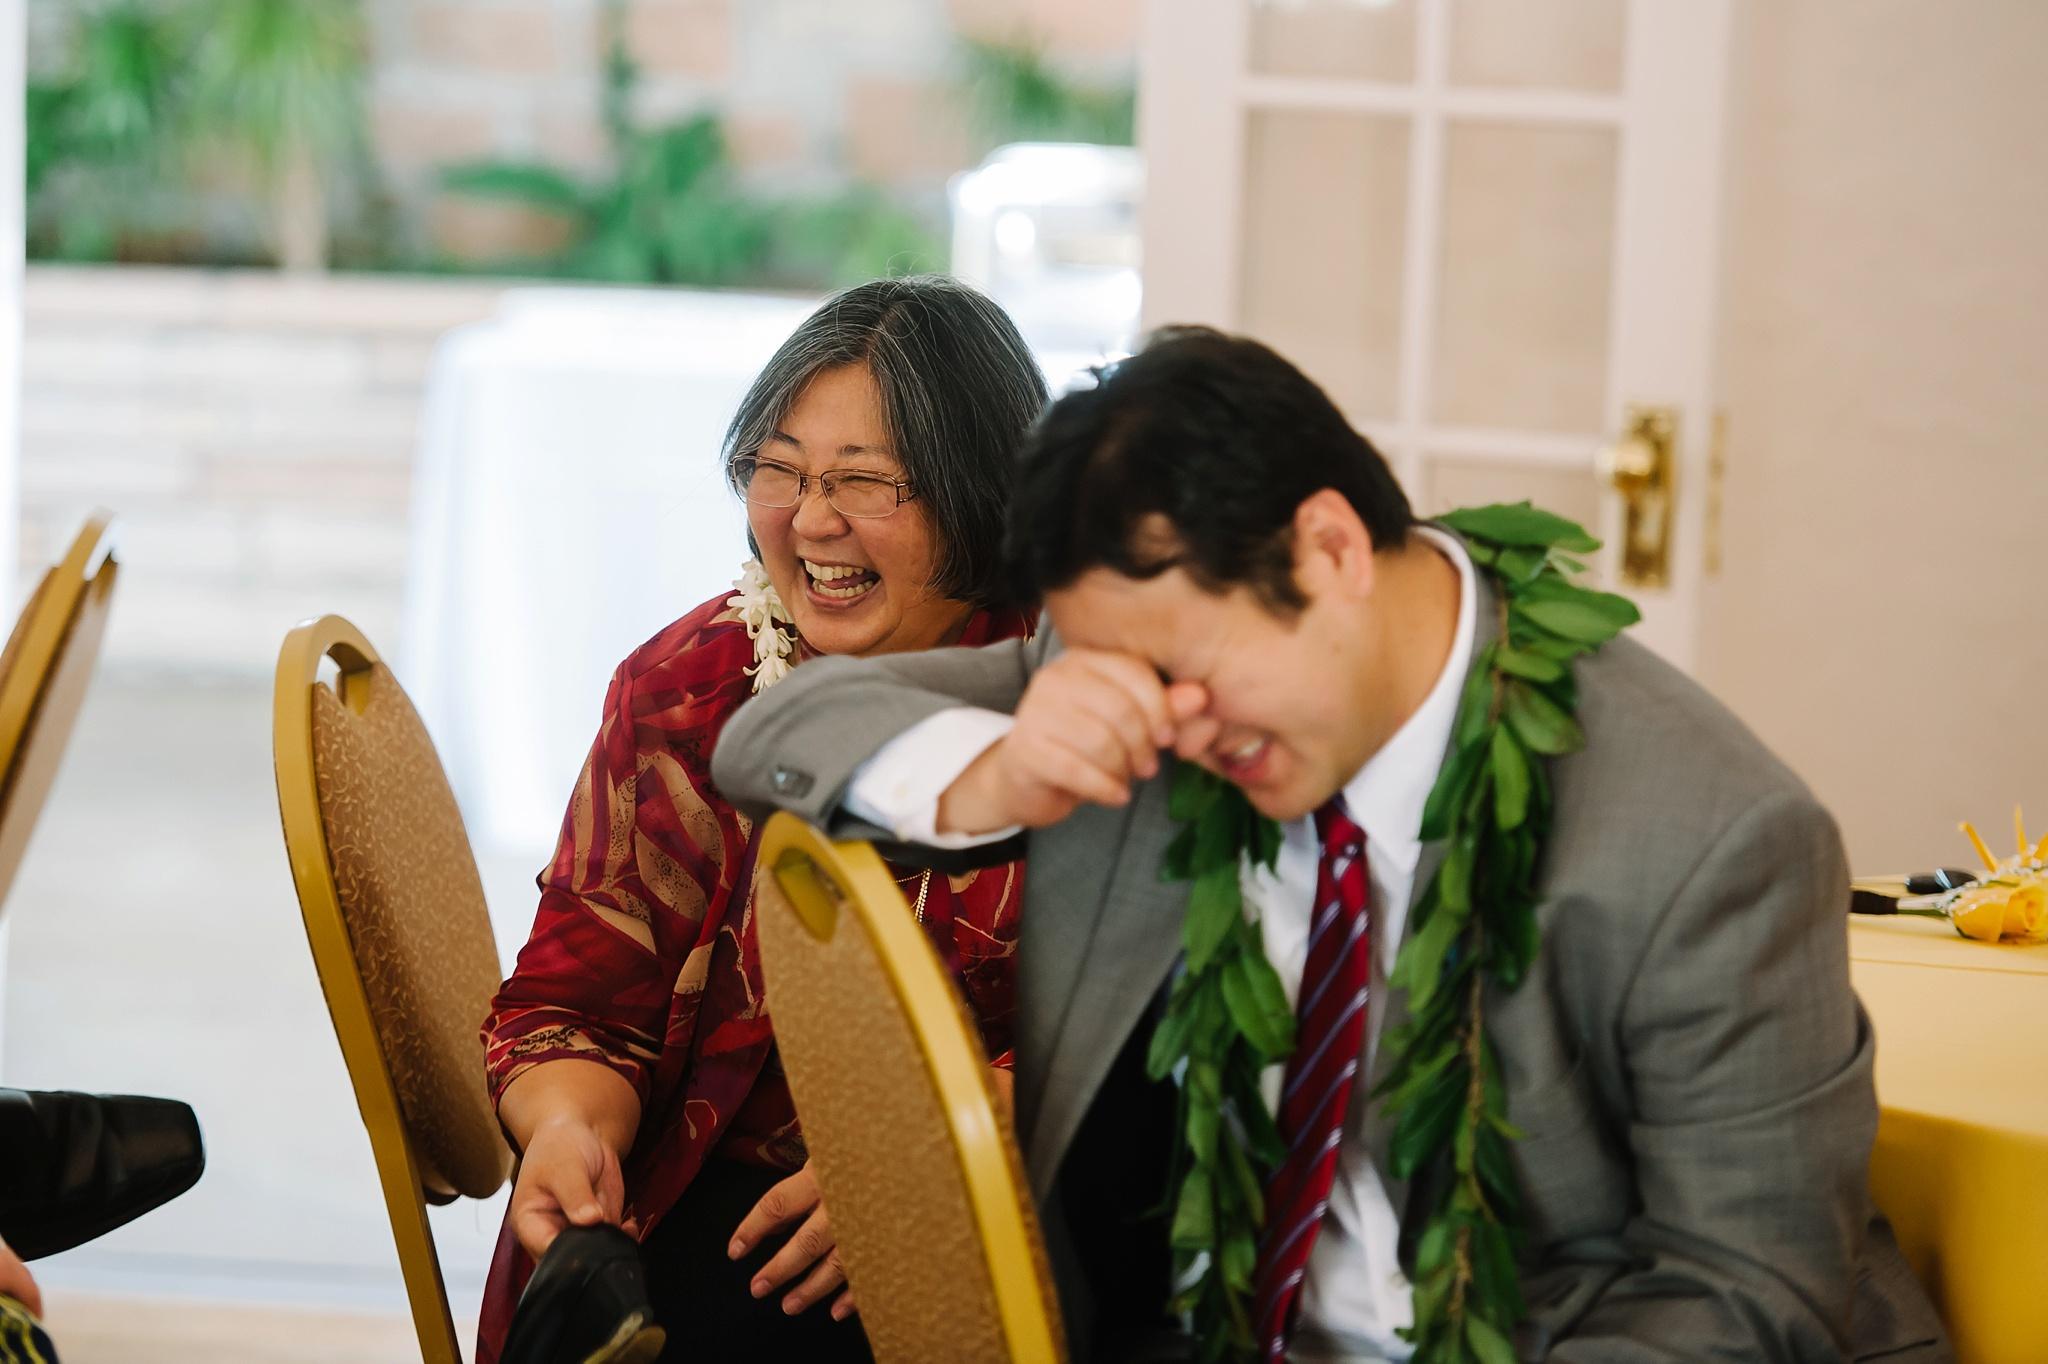 Park City Wedding Photographer Ali Sumsion 100